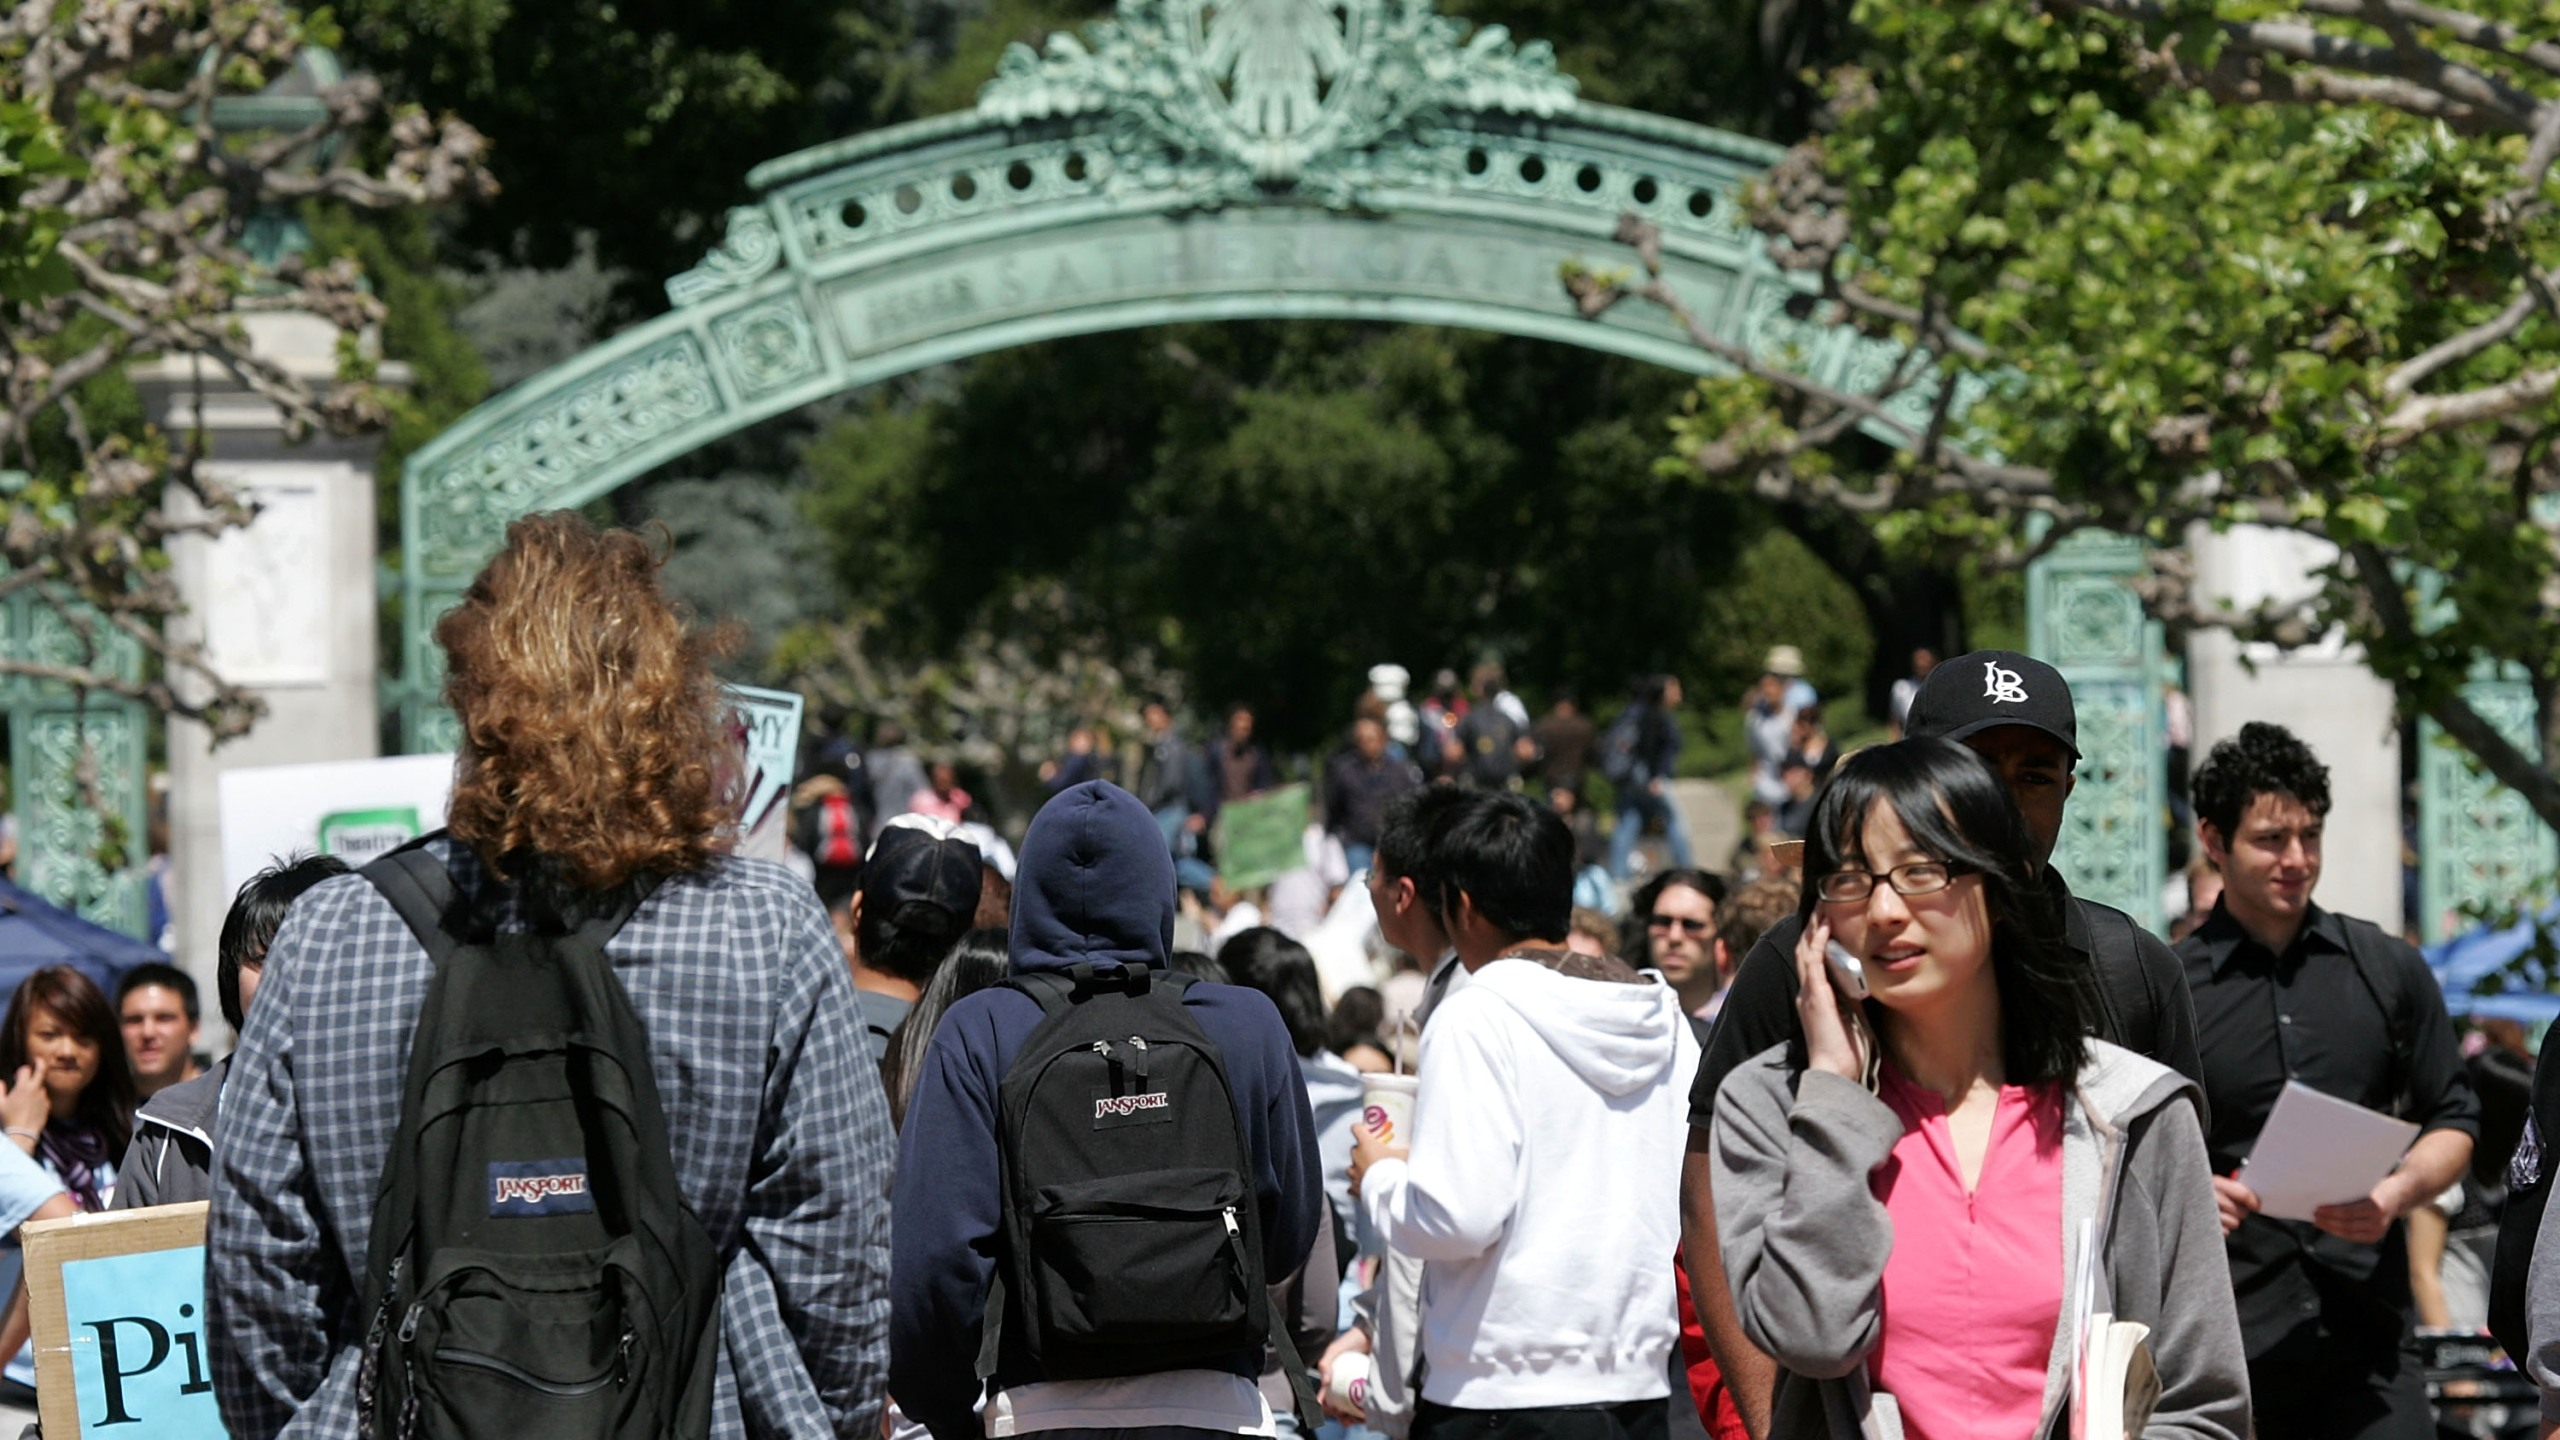 UC Berkeley ranks No. 1 in Forbes top colleges list